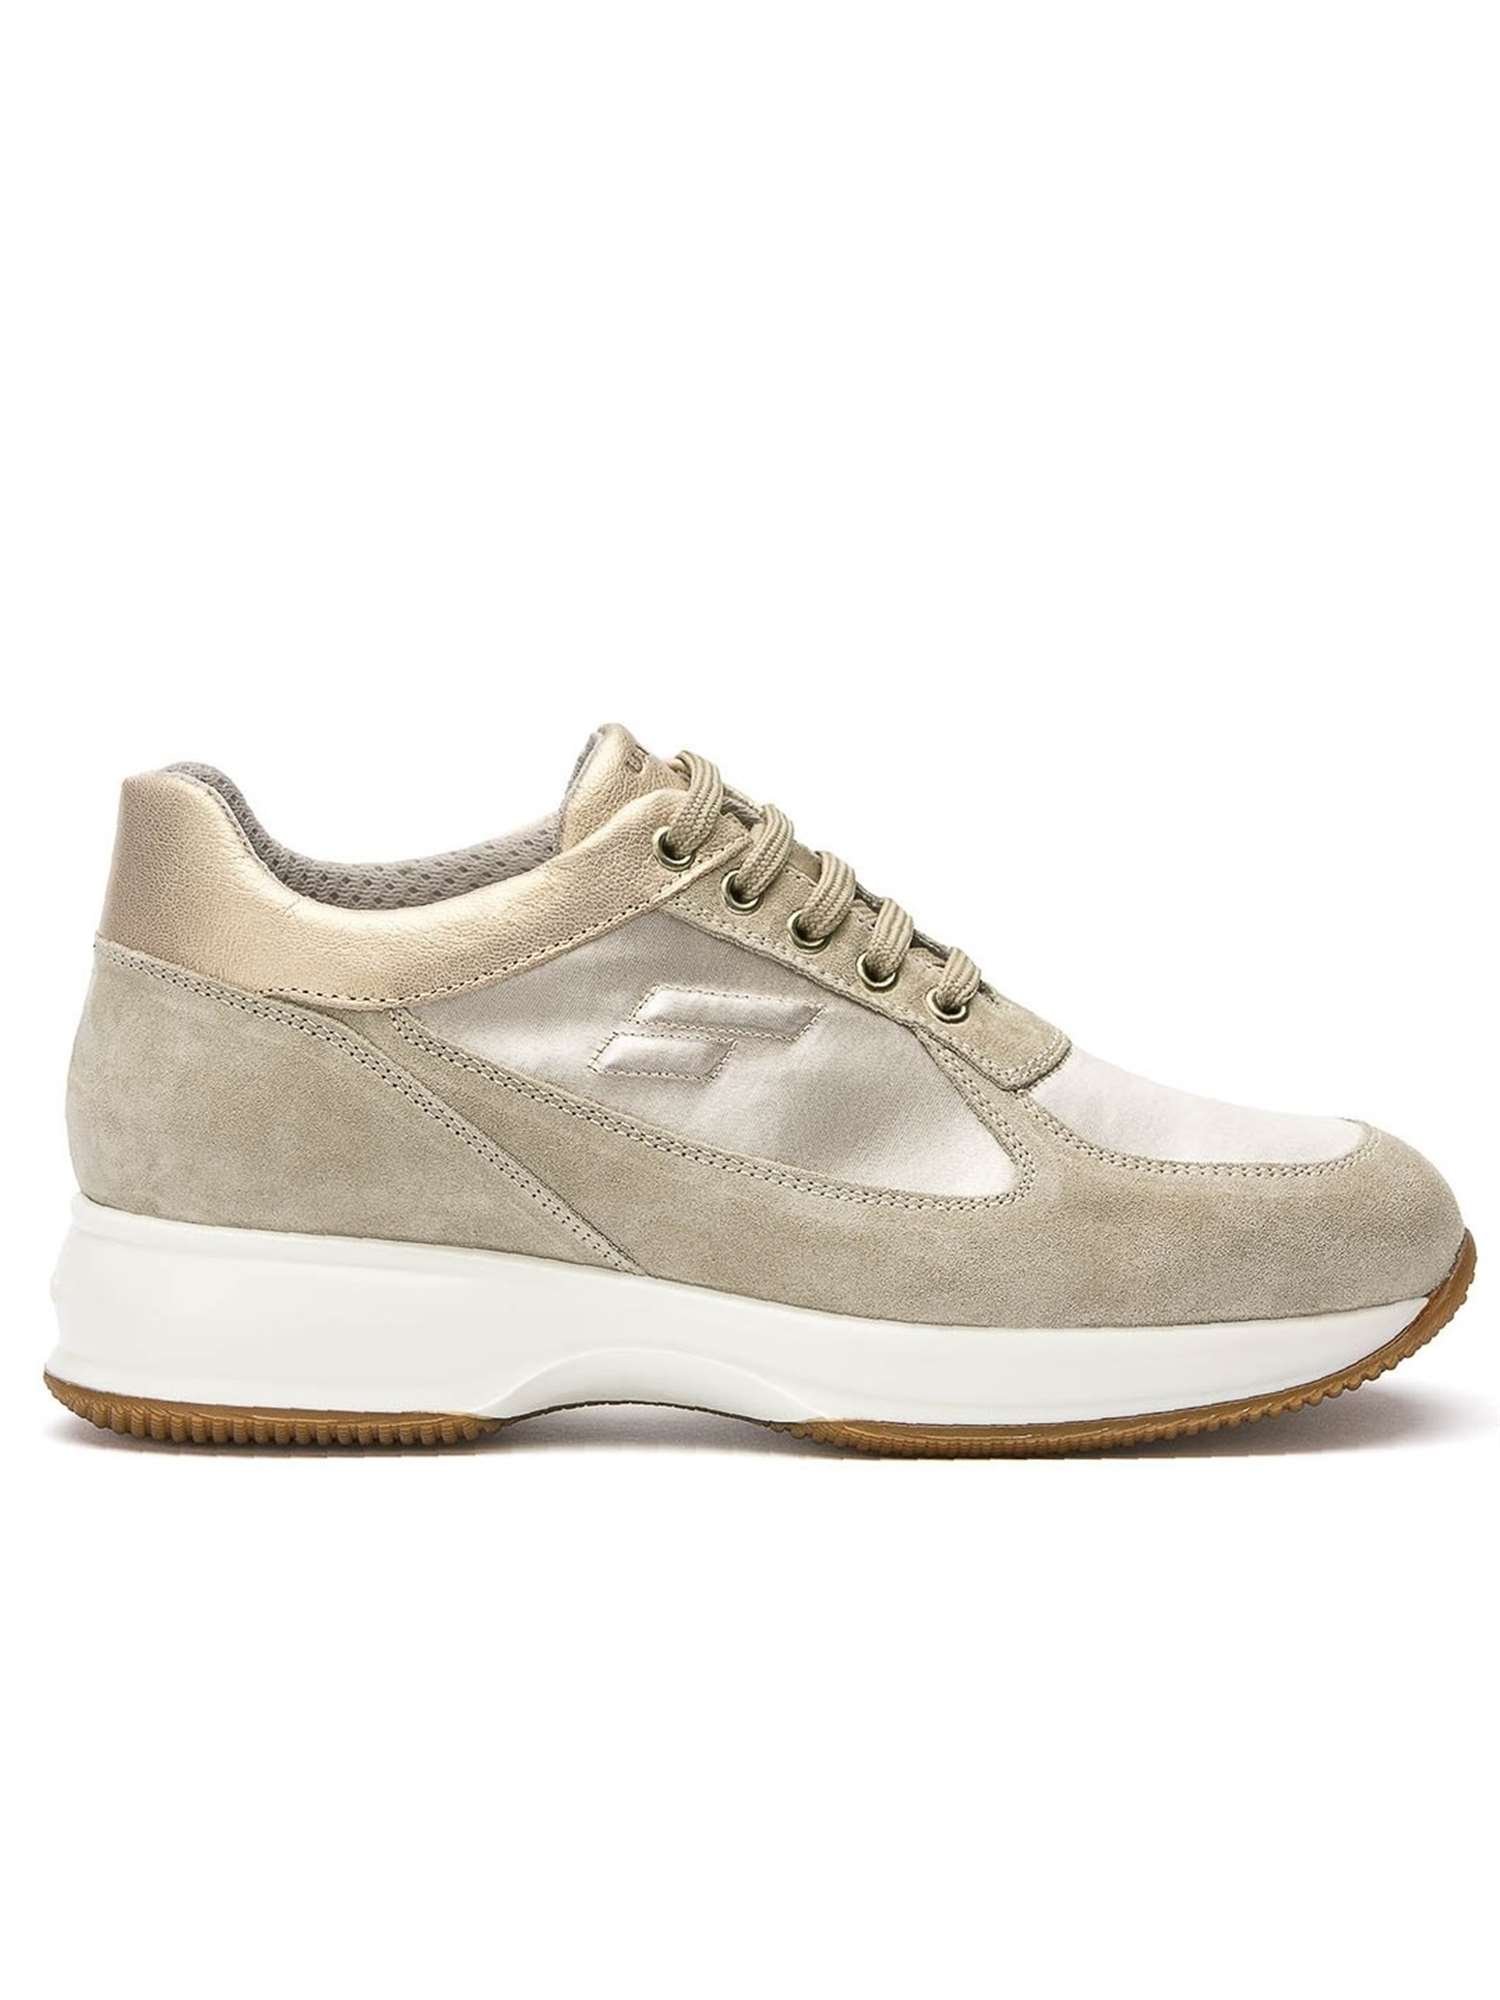 scarpe simil hogan uomo